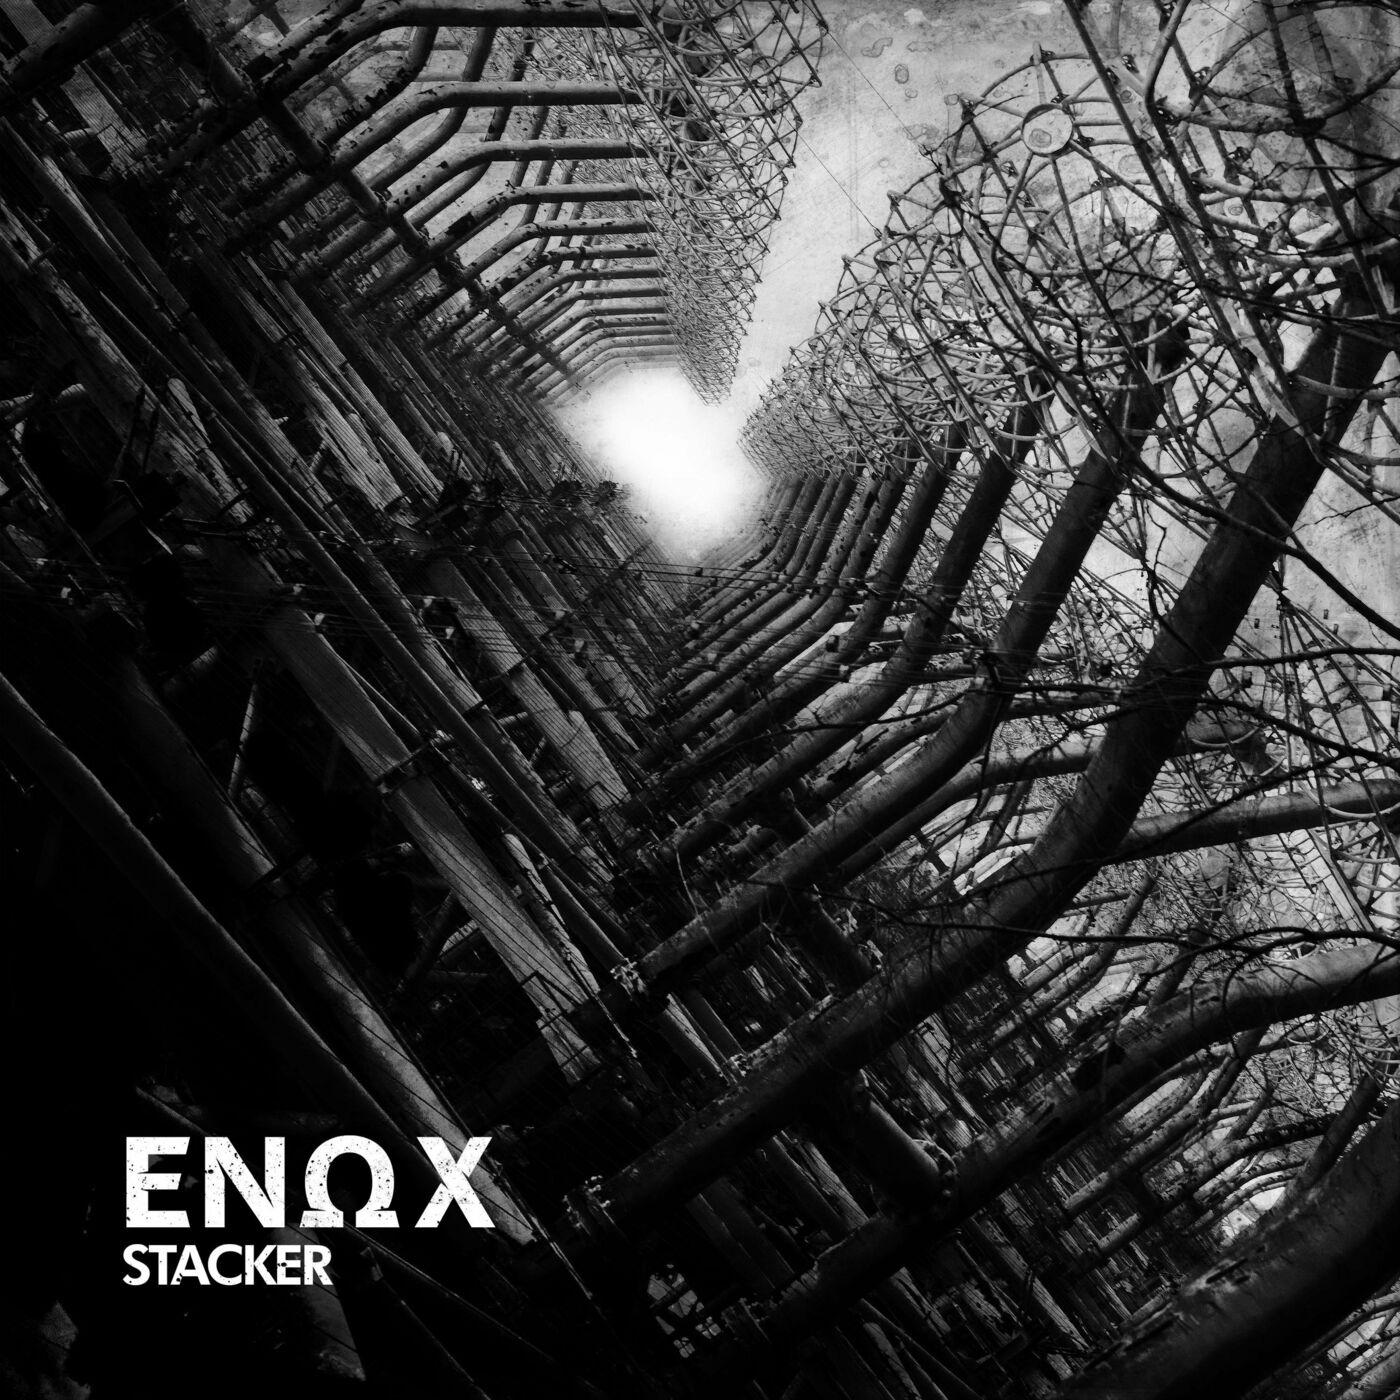 Enox - Stacker [single] (2020)